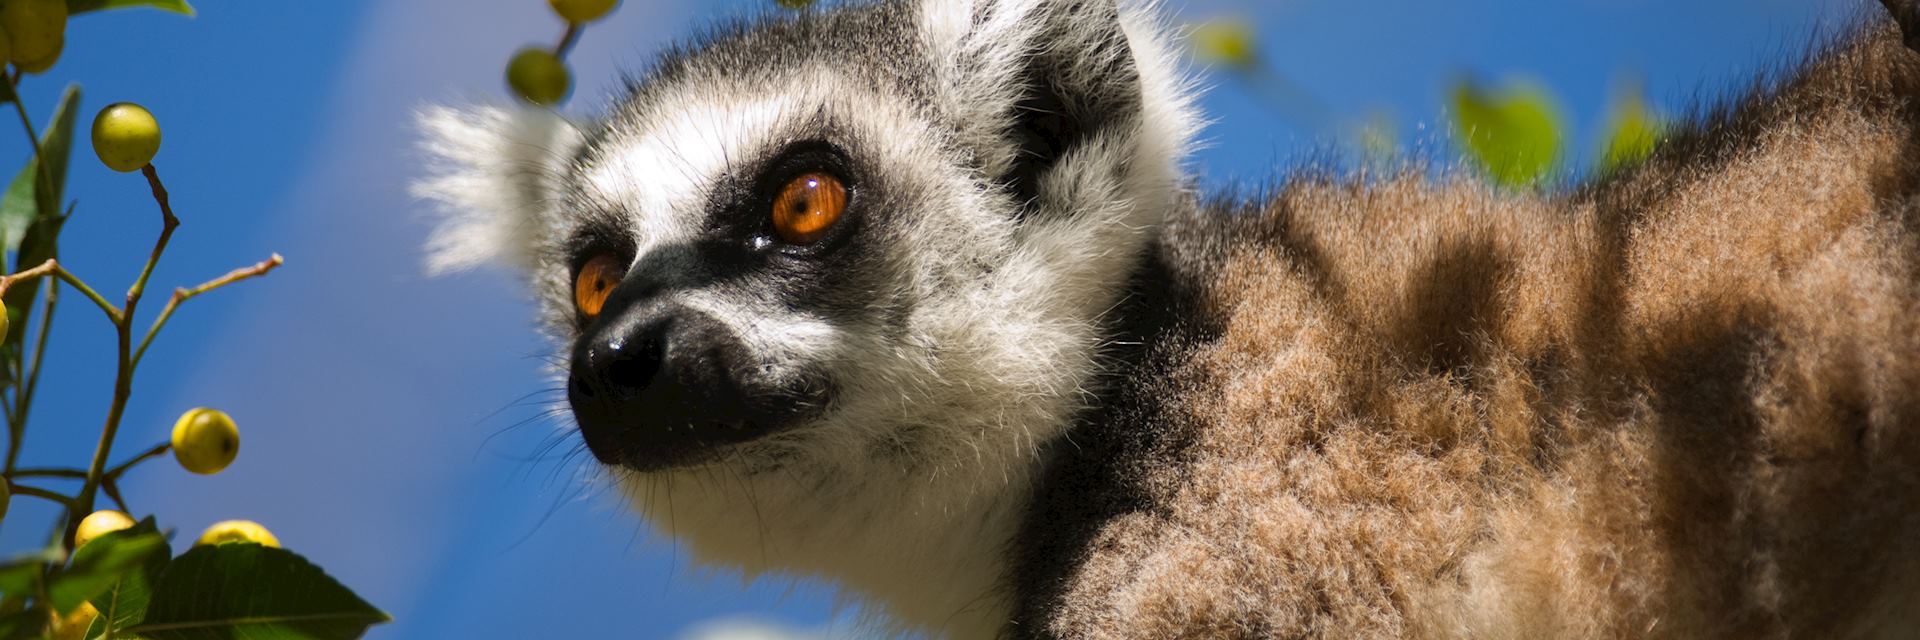 Ring tailed lemur, Andohahela National Park